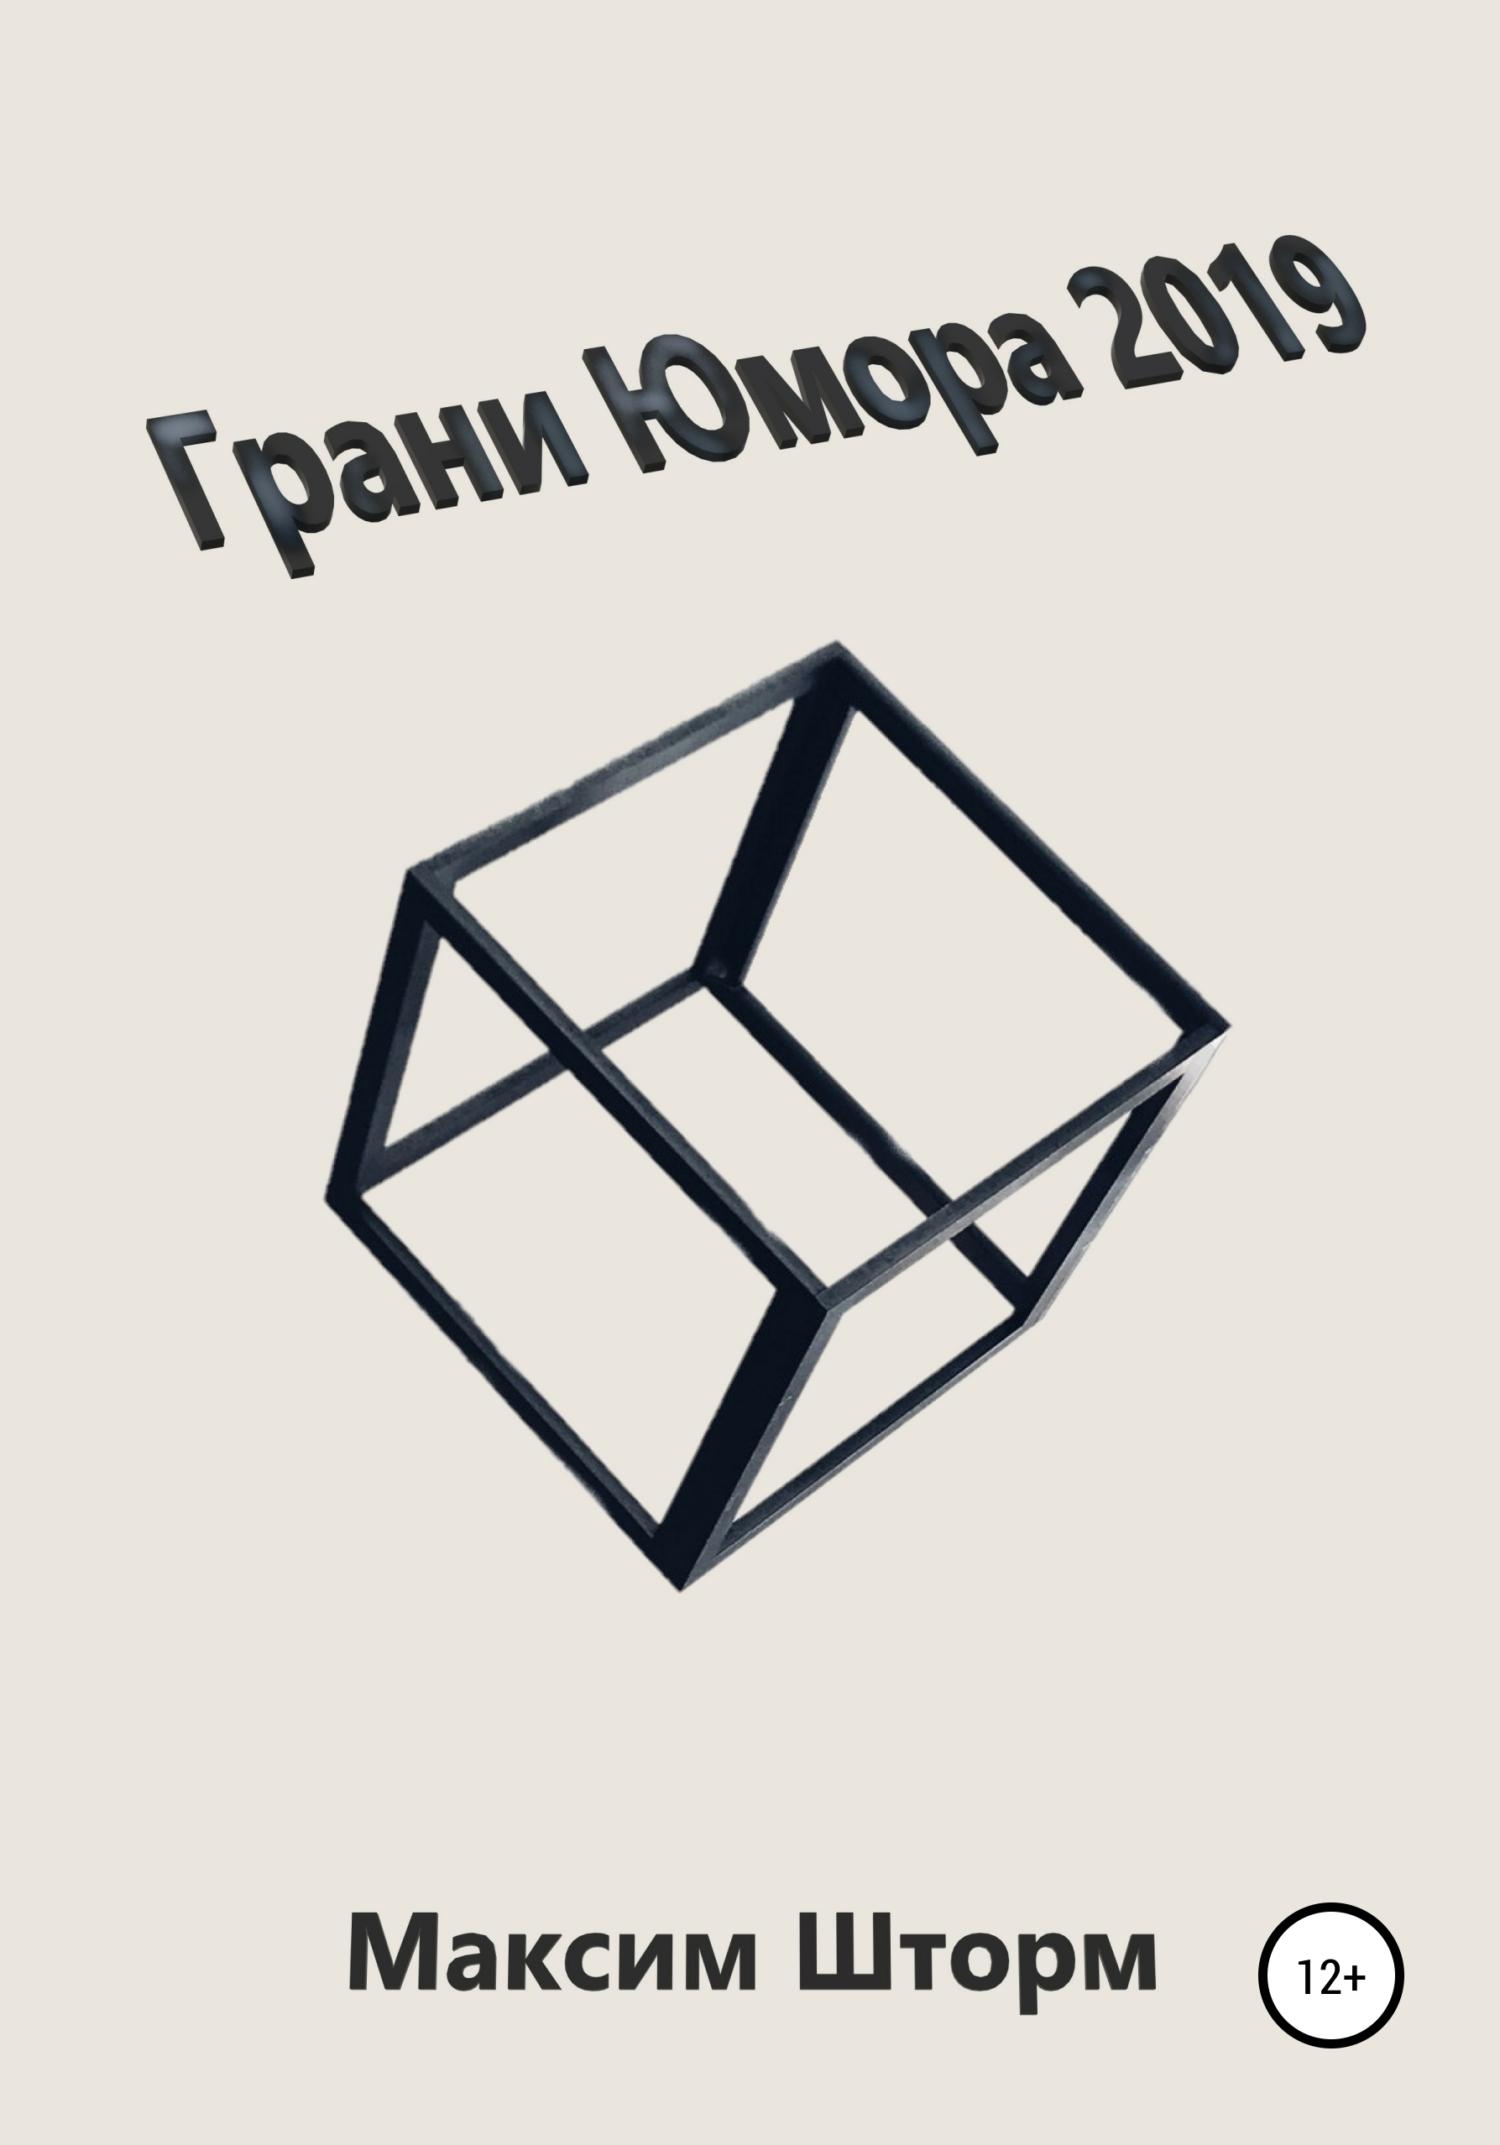 Максим Шторм - Грани юмора 2019